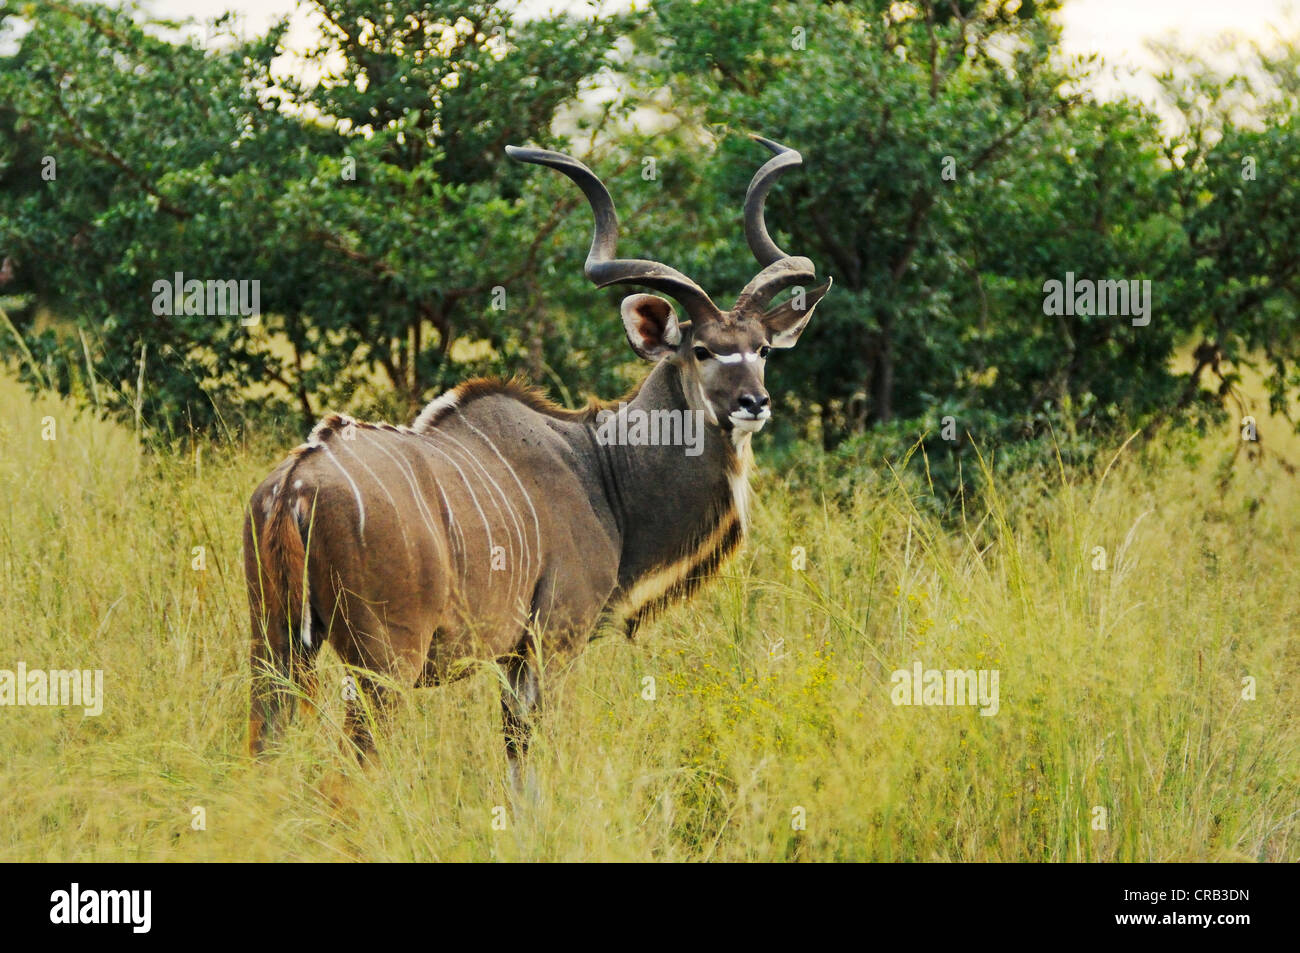 Greater Kudu (Tragelaphus strepsiceros), antelope, in Bwabwata National Park, former Caprivi National Park and Mahango - Stock Image